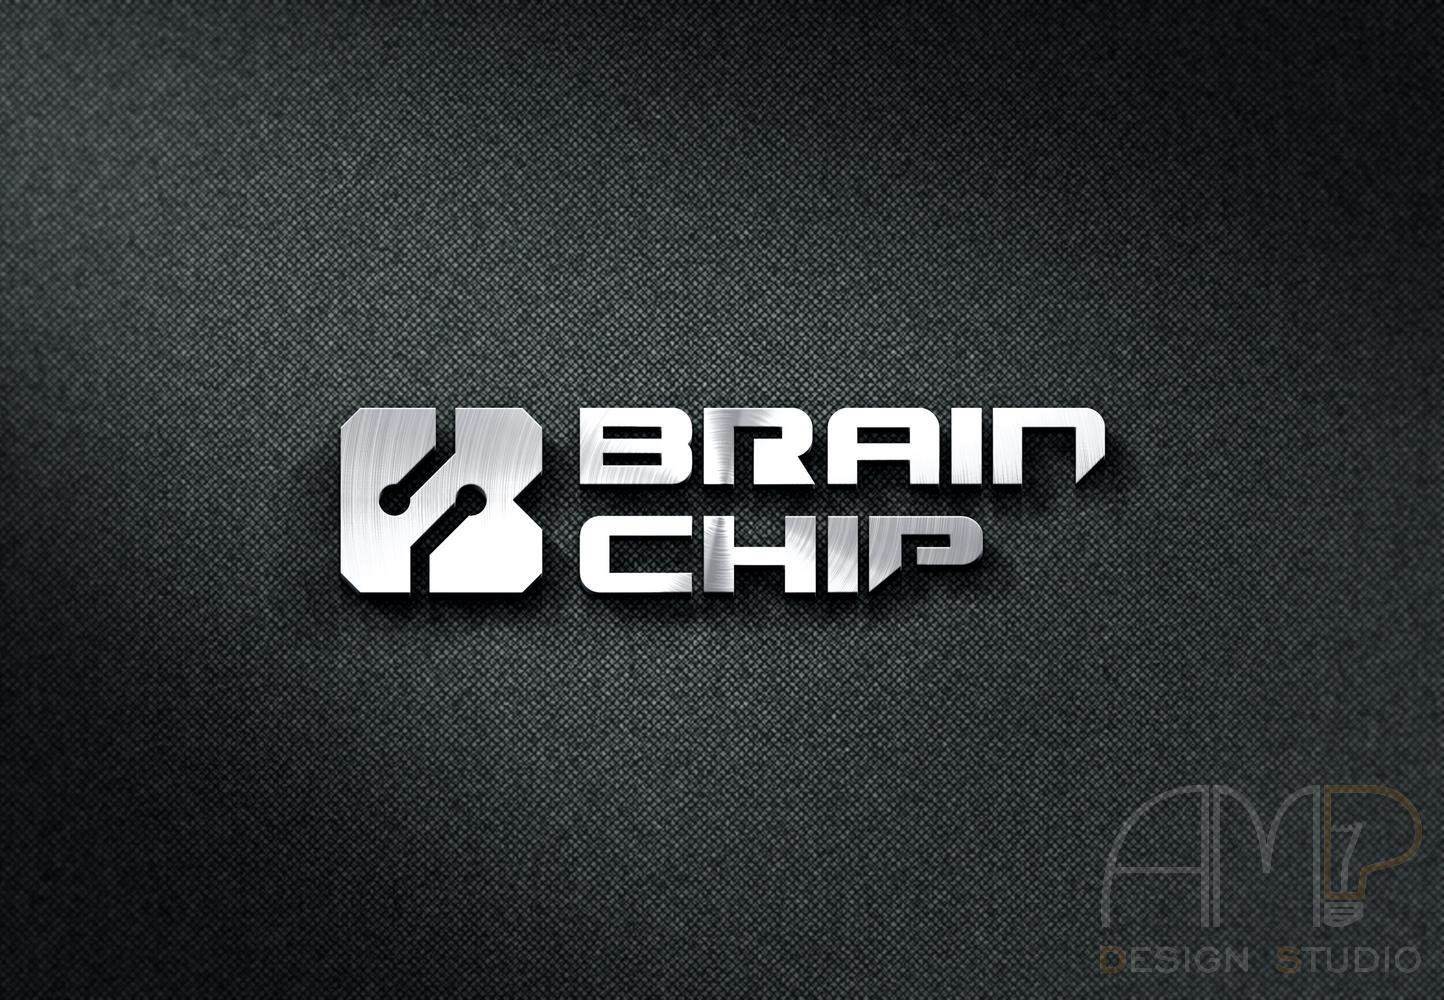 BrainChip logo 4